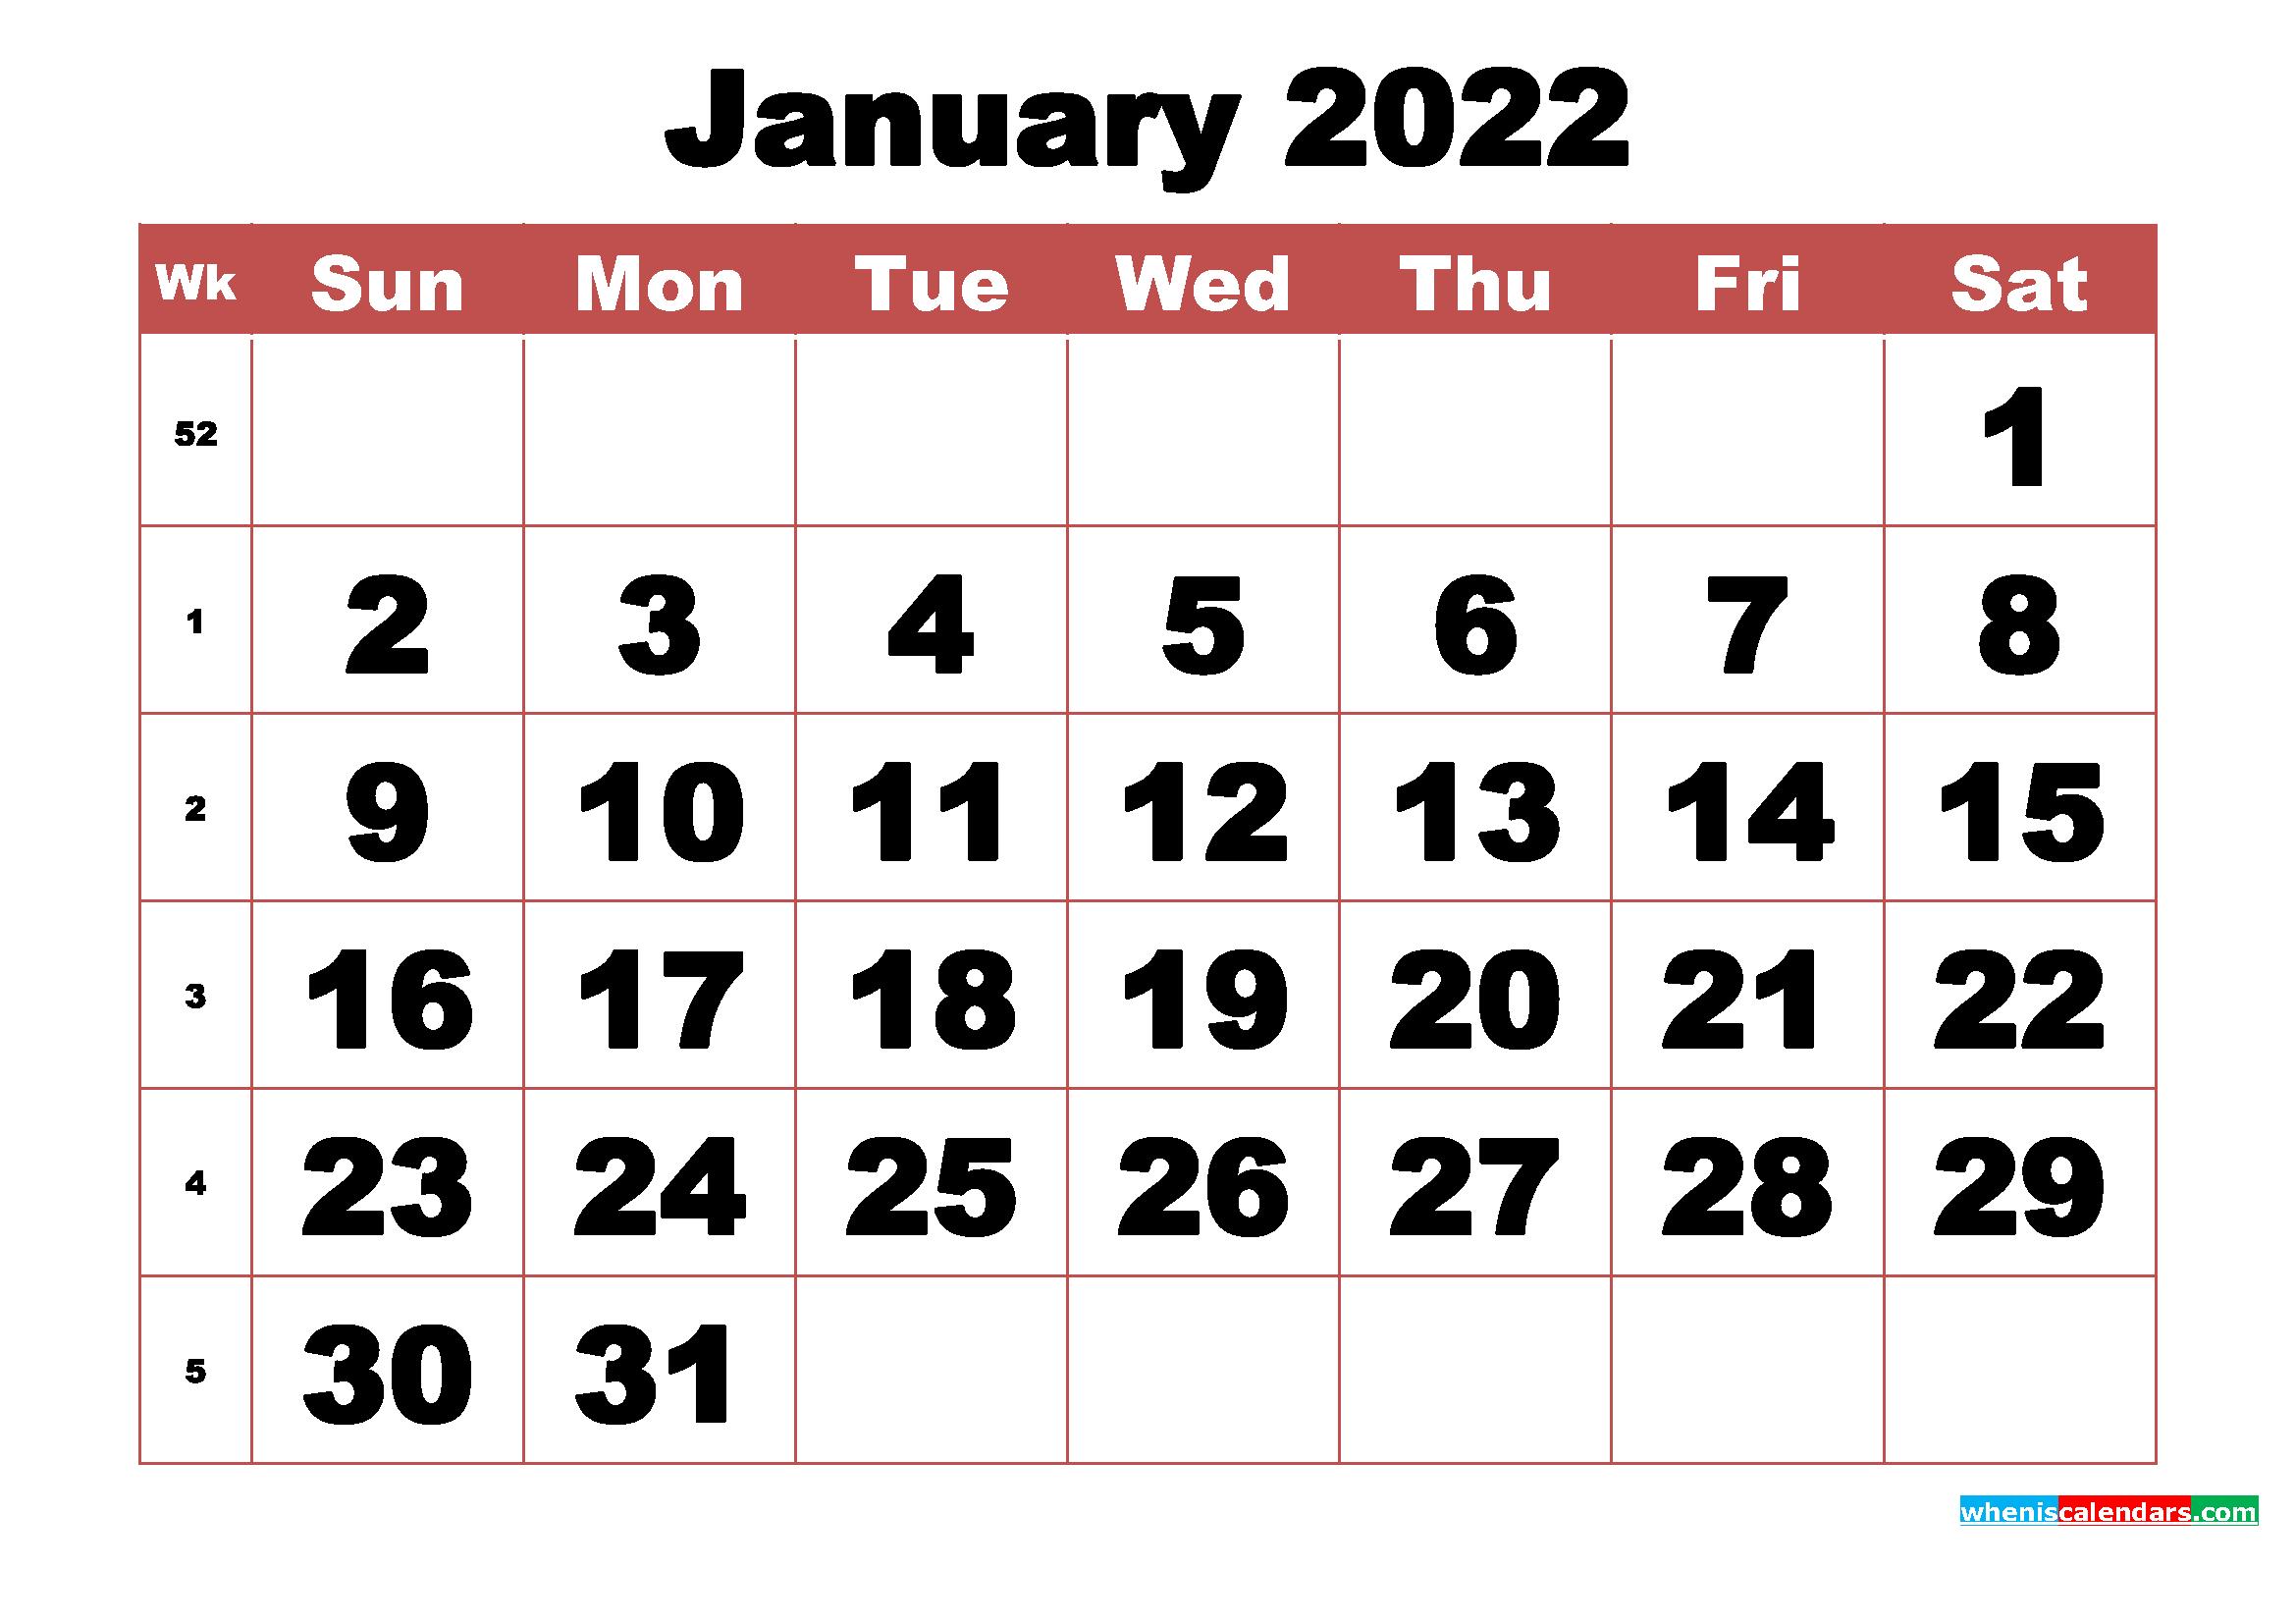 Free Printable January 2022 Calendar With Week Numbers throughout Printable Calendar January 2022 Floral Image